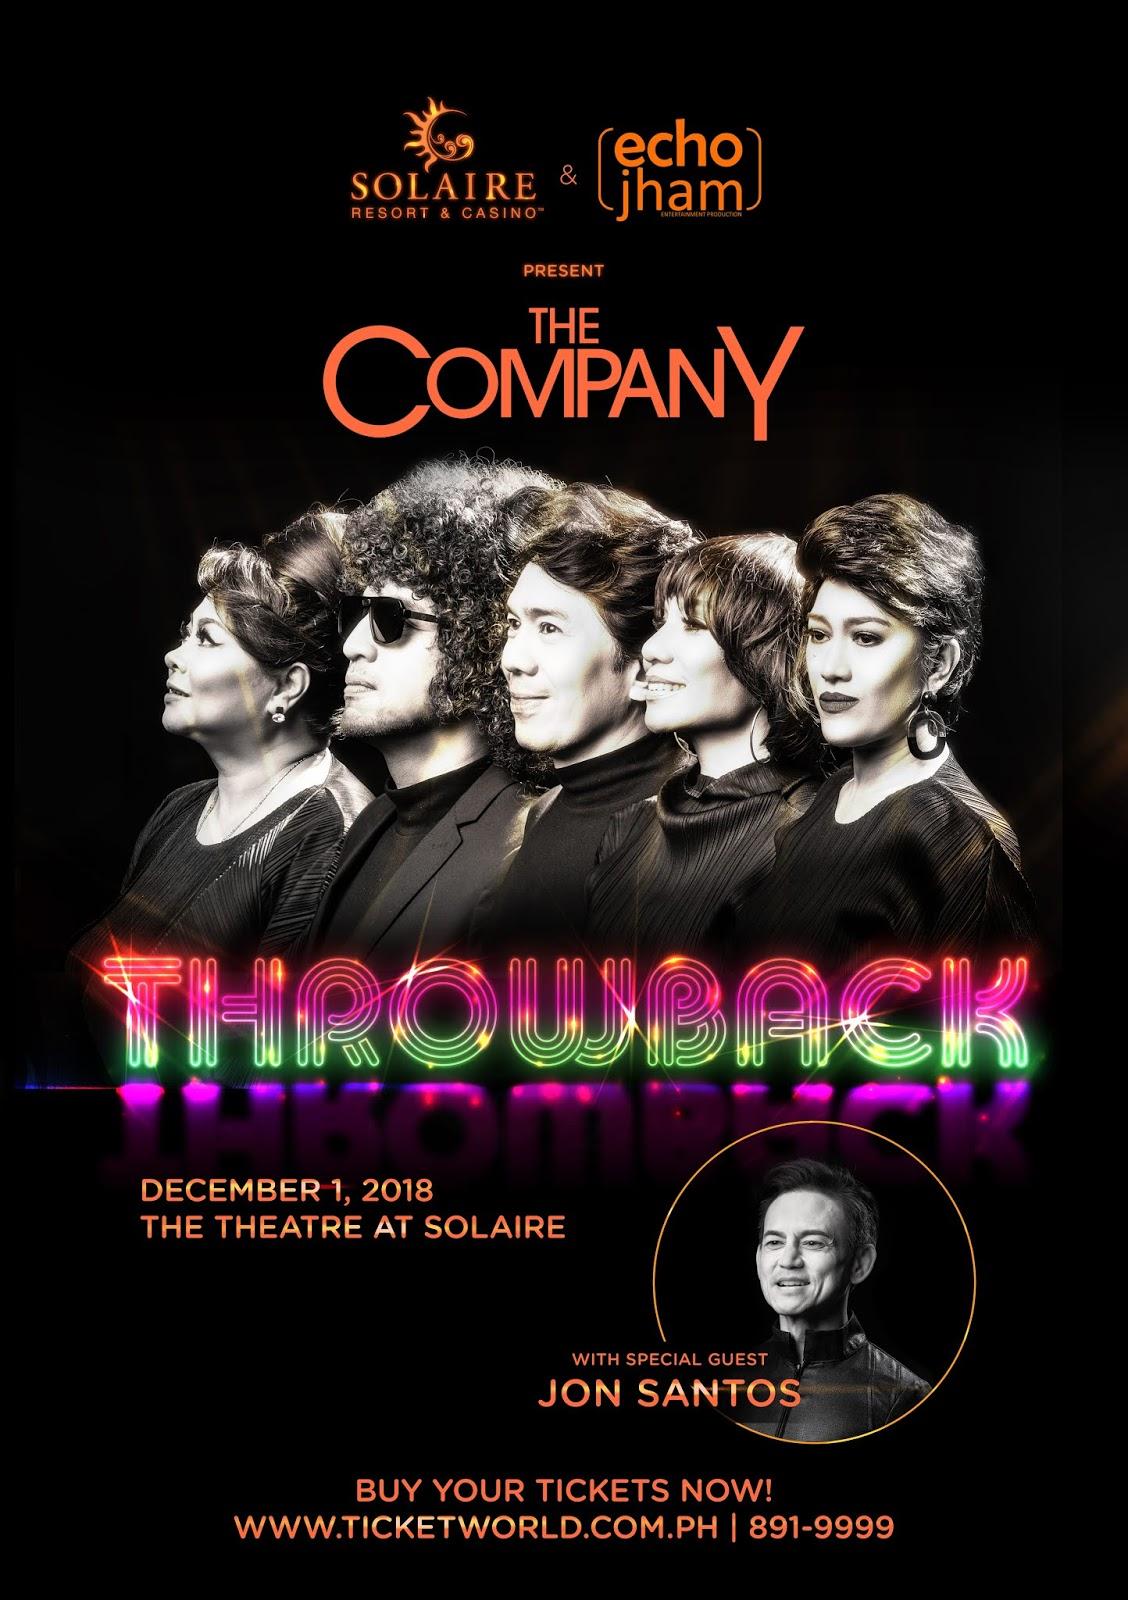 Throwback With The Company And Jon Santos K Pop Power Bank Exo Bts Bangtan Boys 5000mha